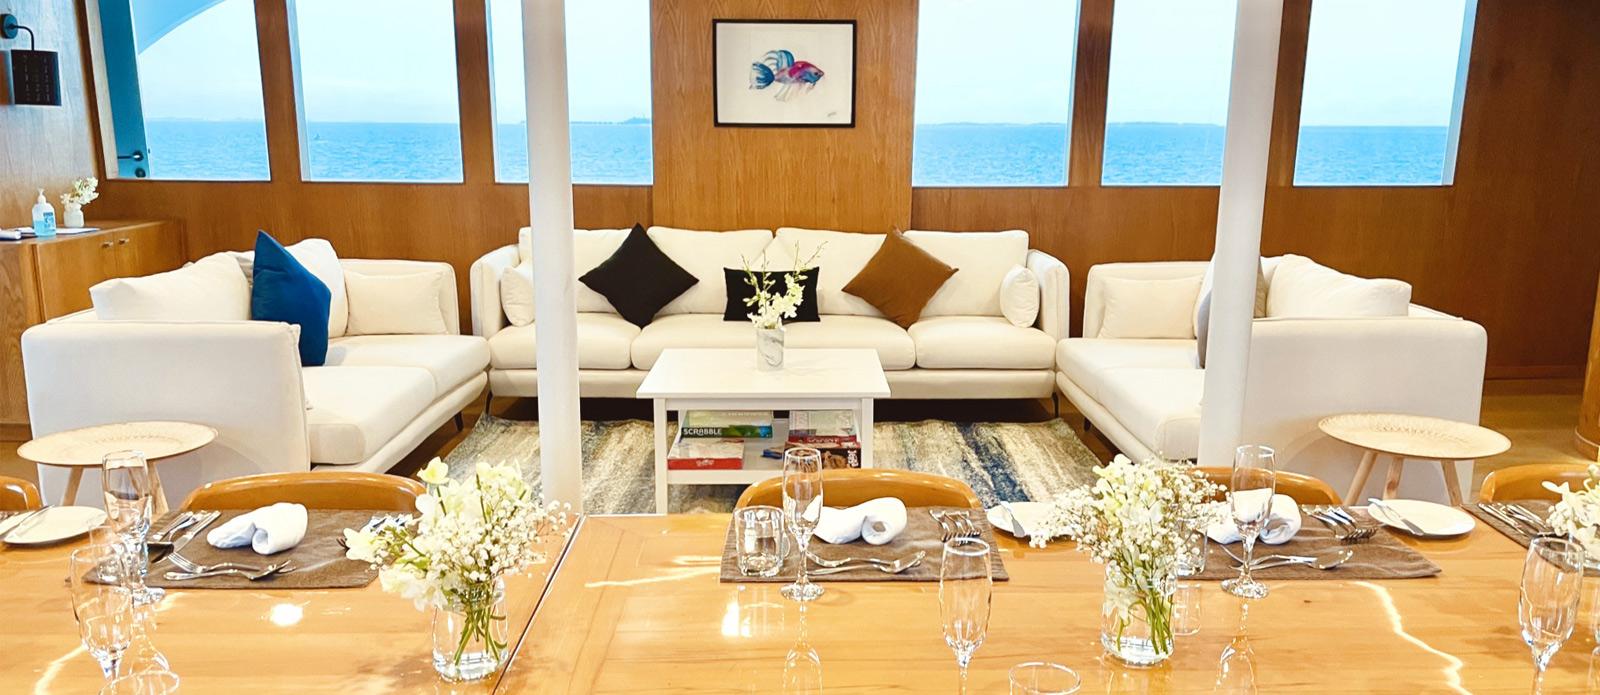 Safira-Luxury-Yacht-For-Sale-Interior-1